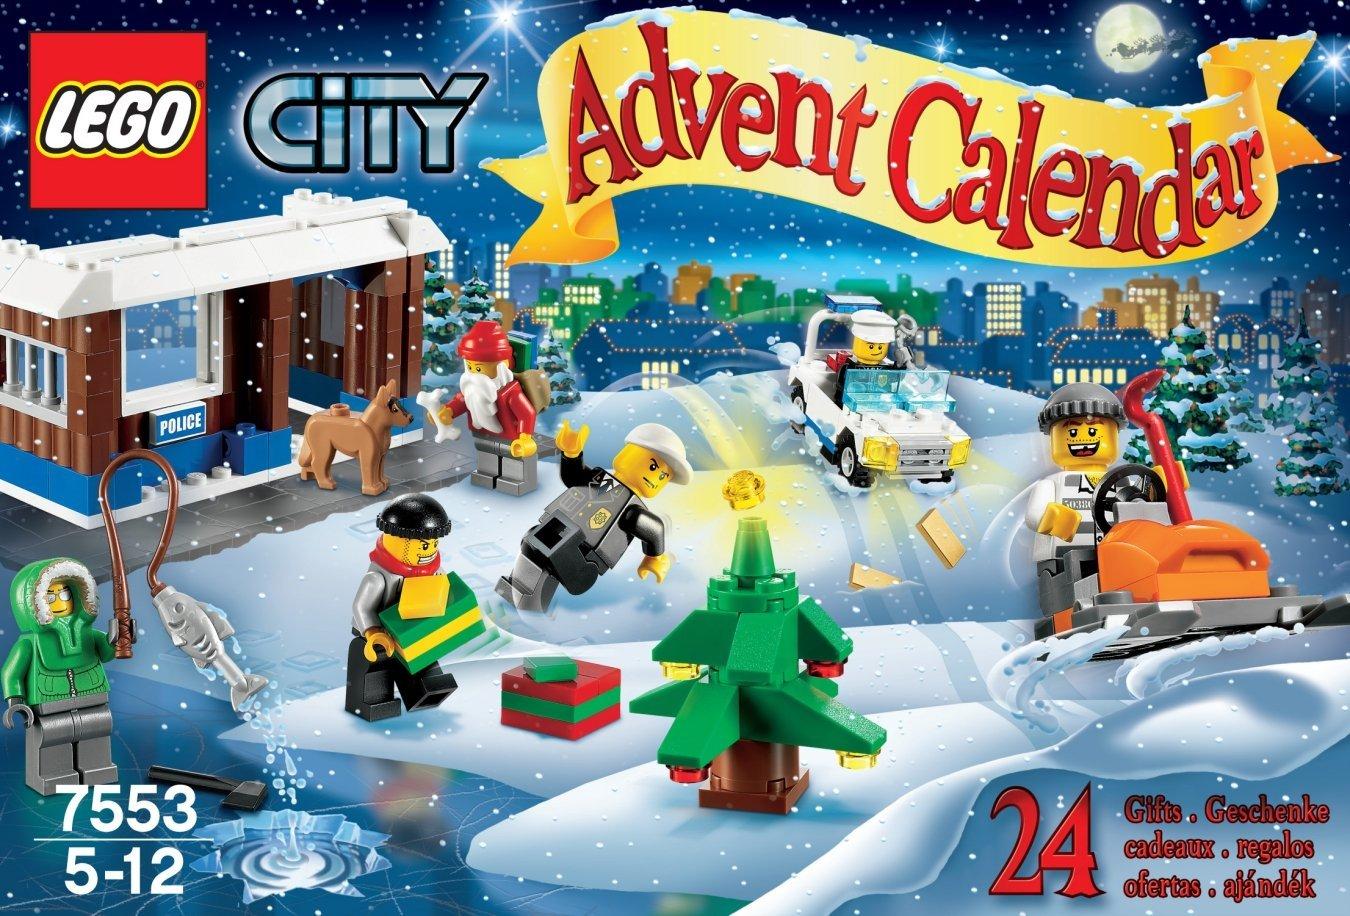 7553 le calendrier de l 39 avent city wiki lego fandom for Adventskalender duplo